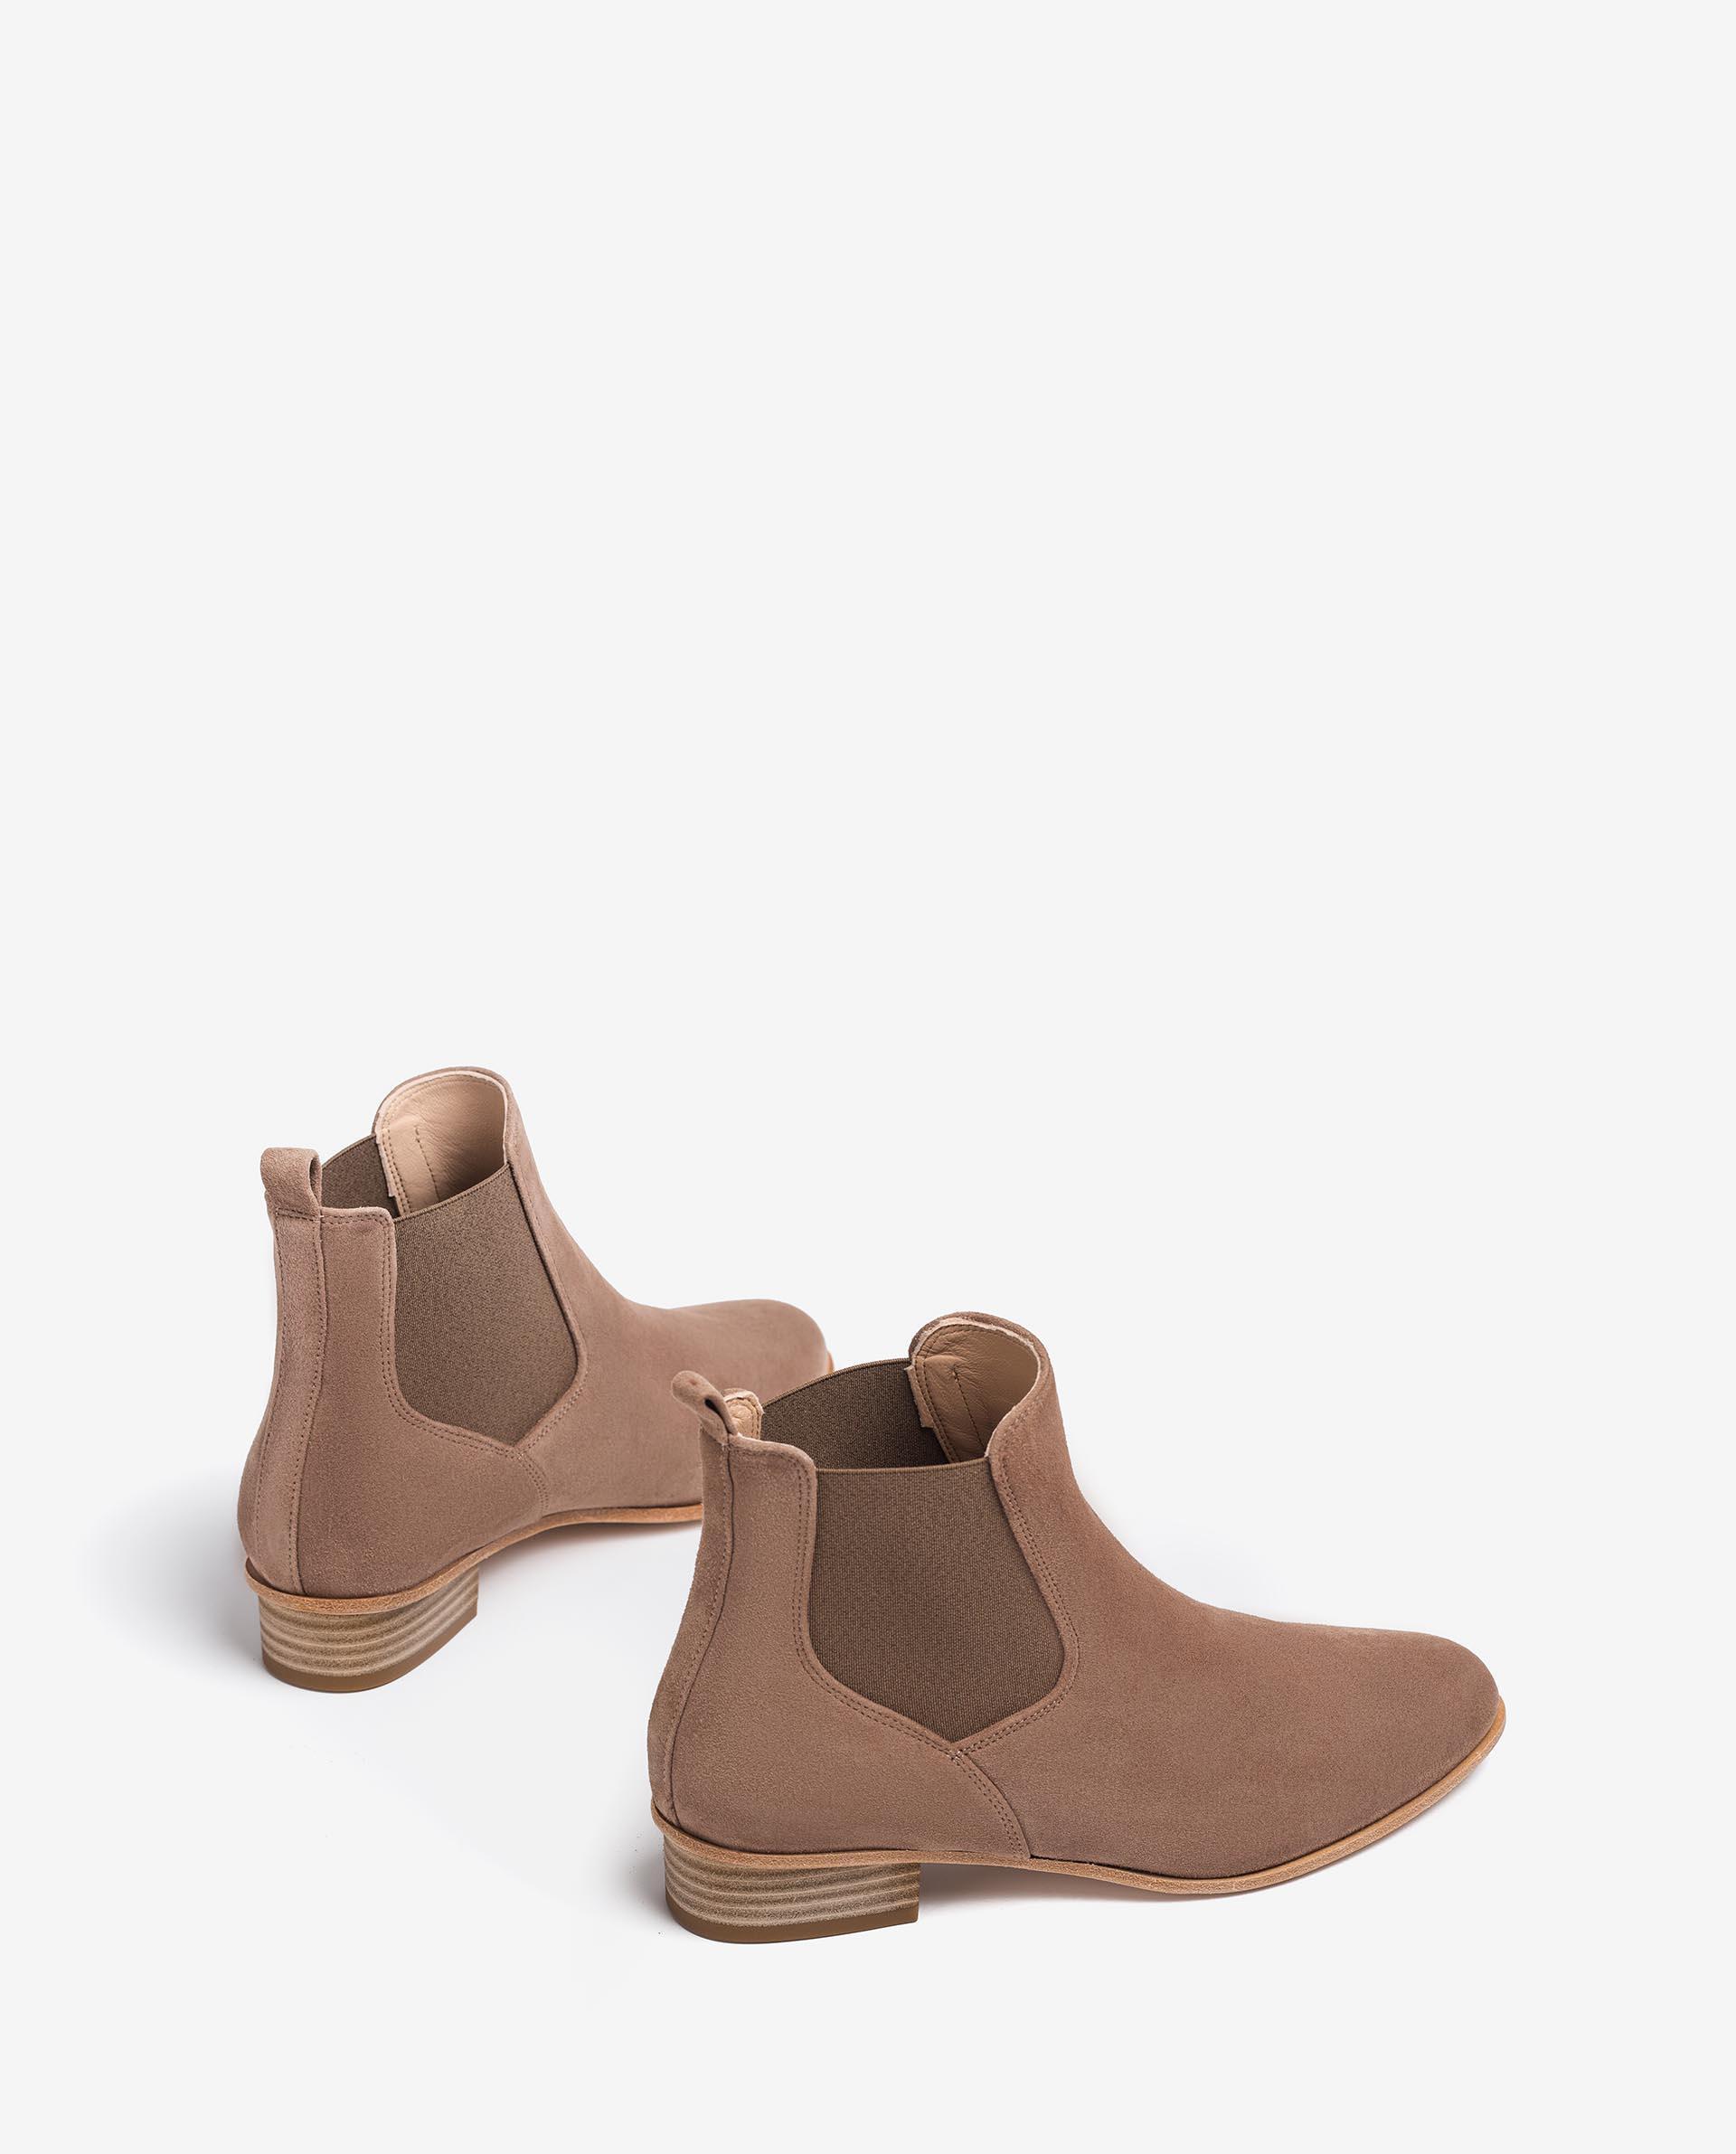 UNISA Kid suede Chelsea ankle boots BAILON_KS 2